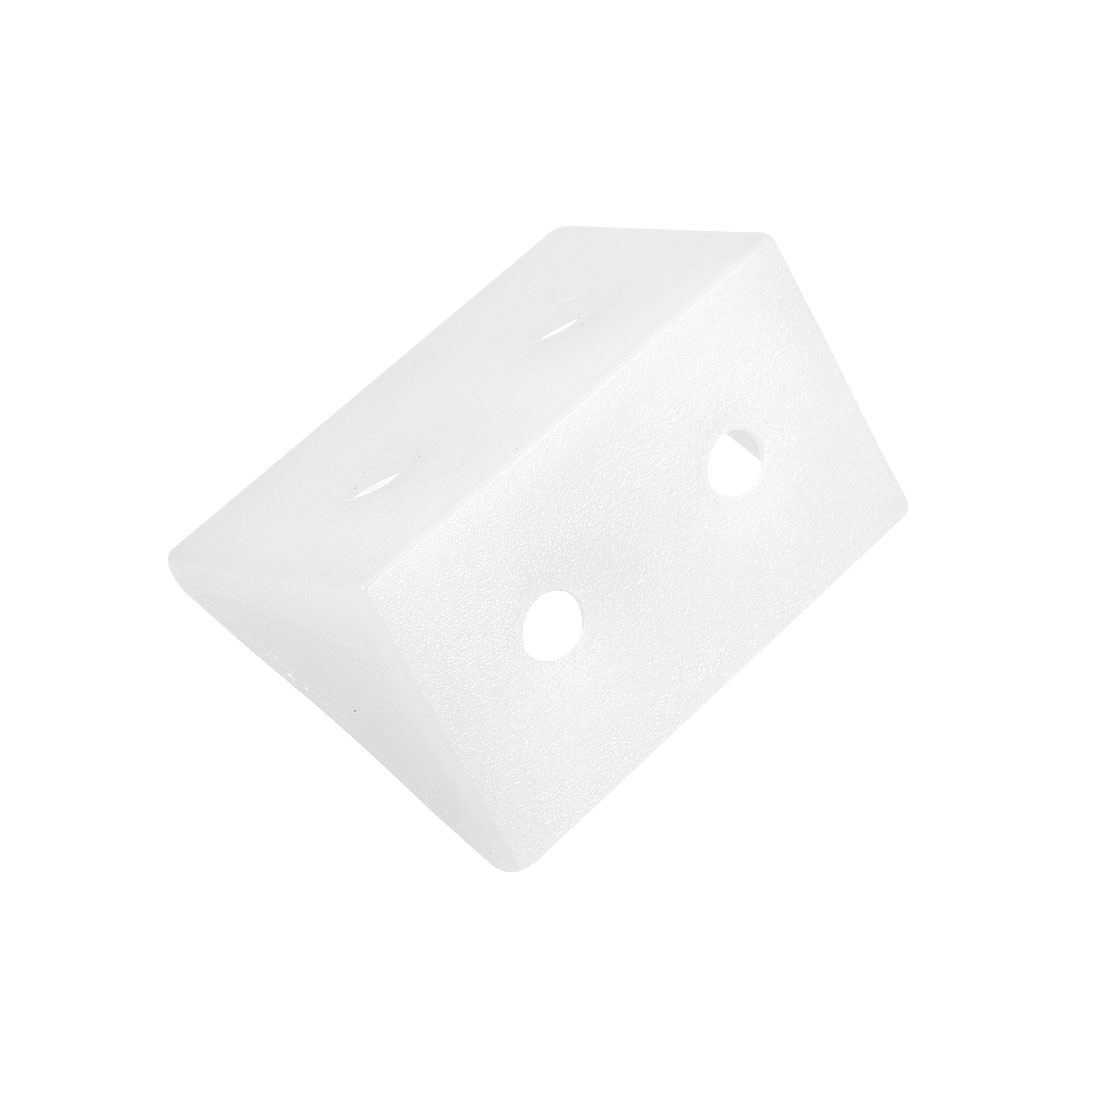 100 Pcs Shelf Cabinet Door 90 Degree Plastic Corner Braces 4 Holes Angle Bracket